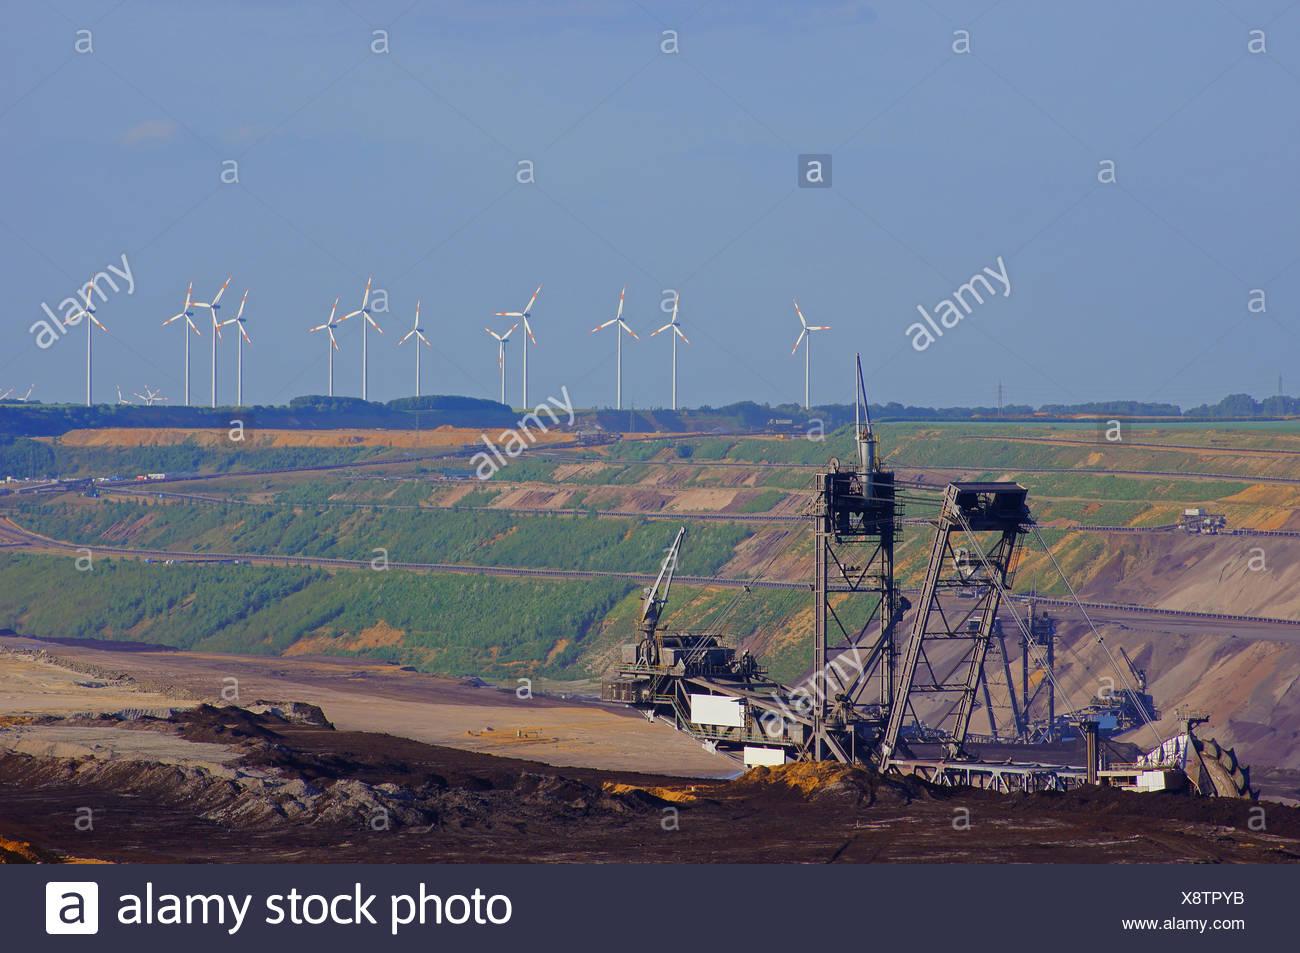 opencast,mining,wind turbines - Stock Image